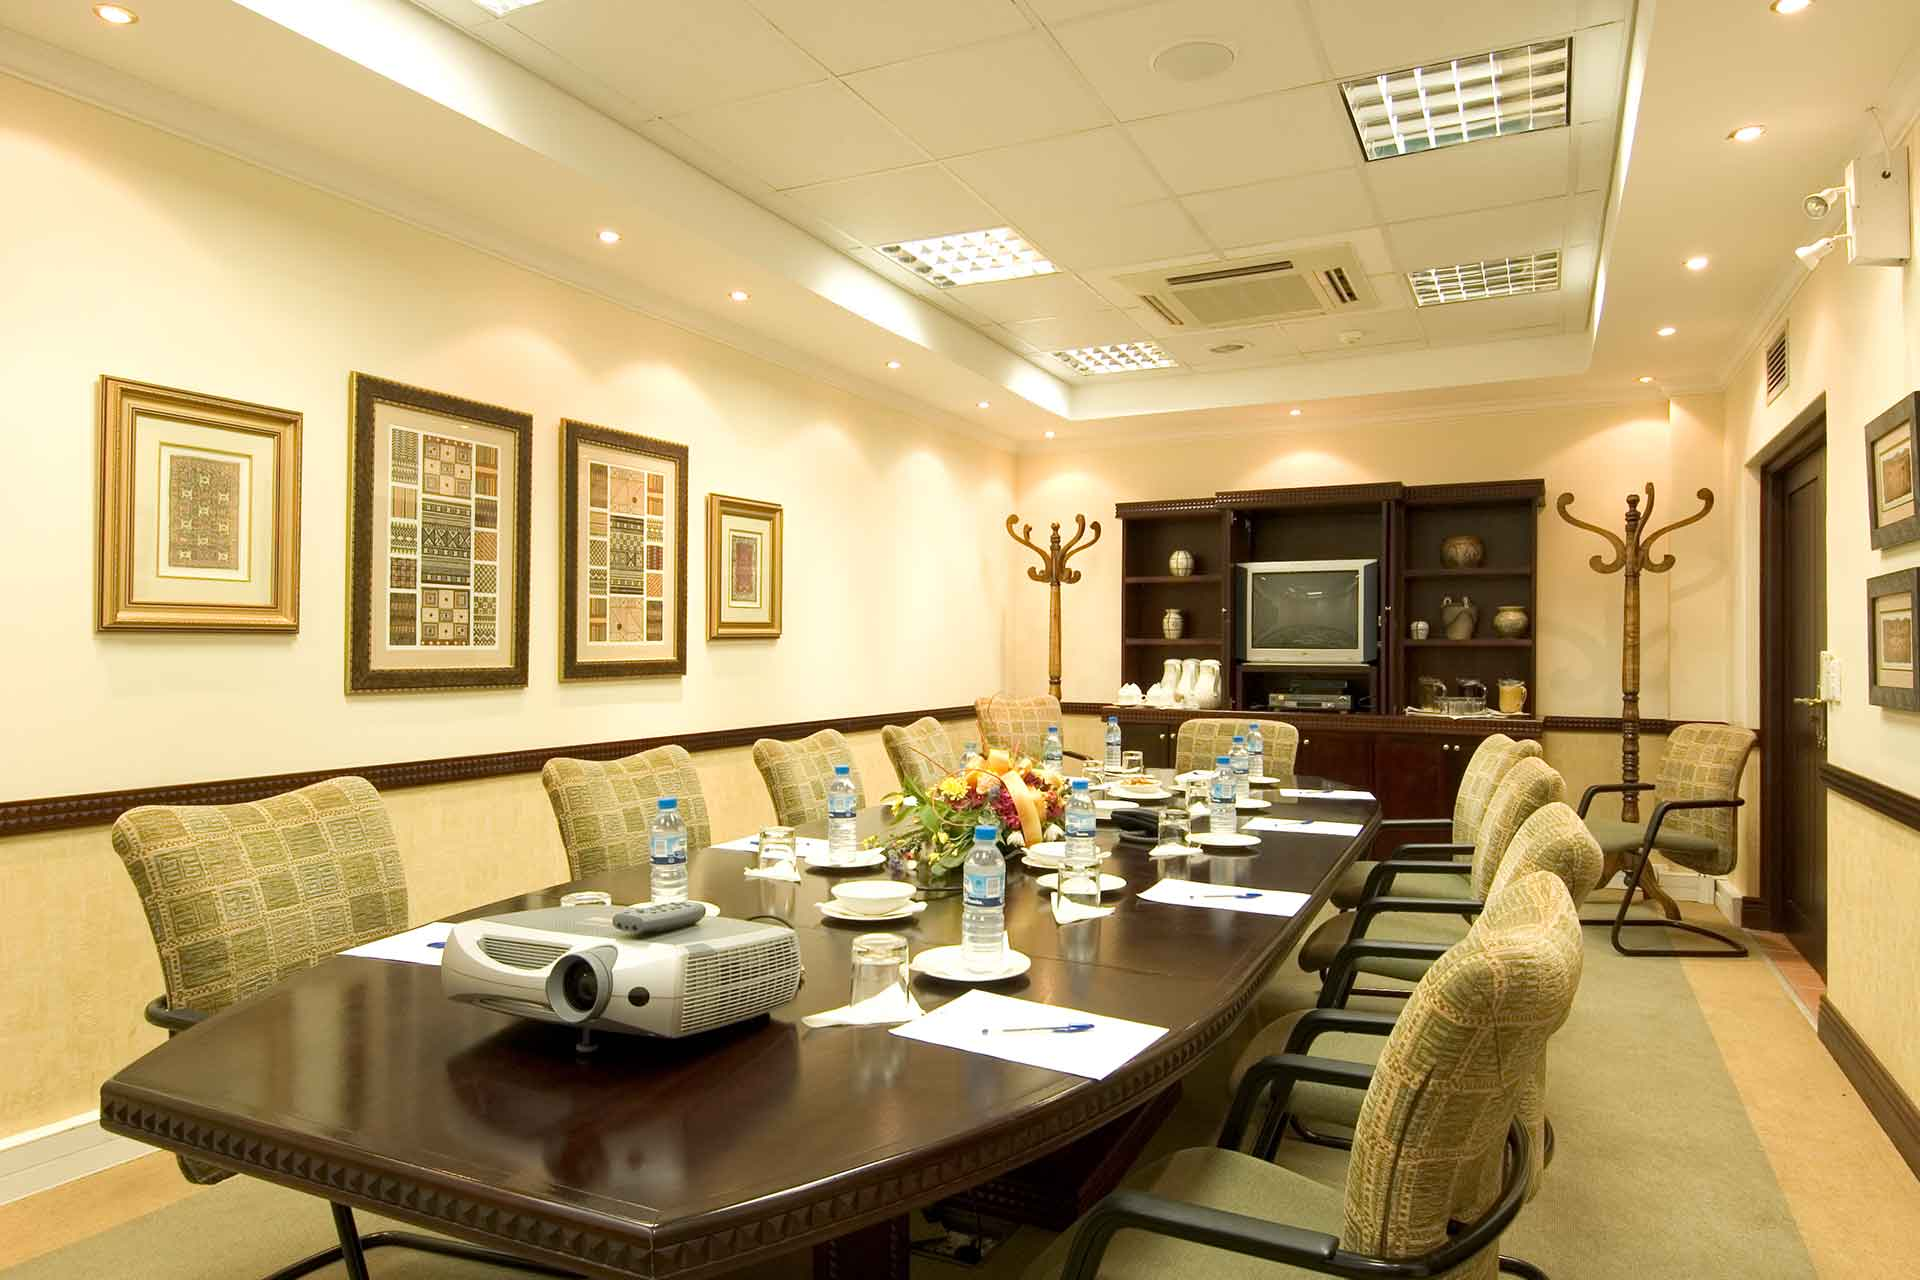 A boardroom setup at AVANI Pemba Beach Hotel